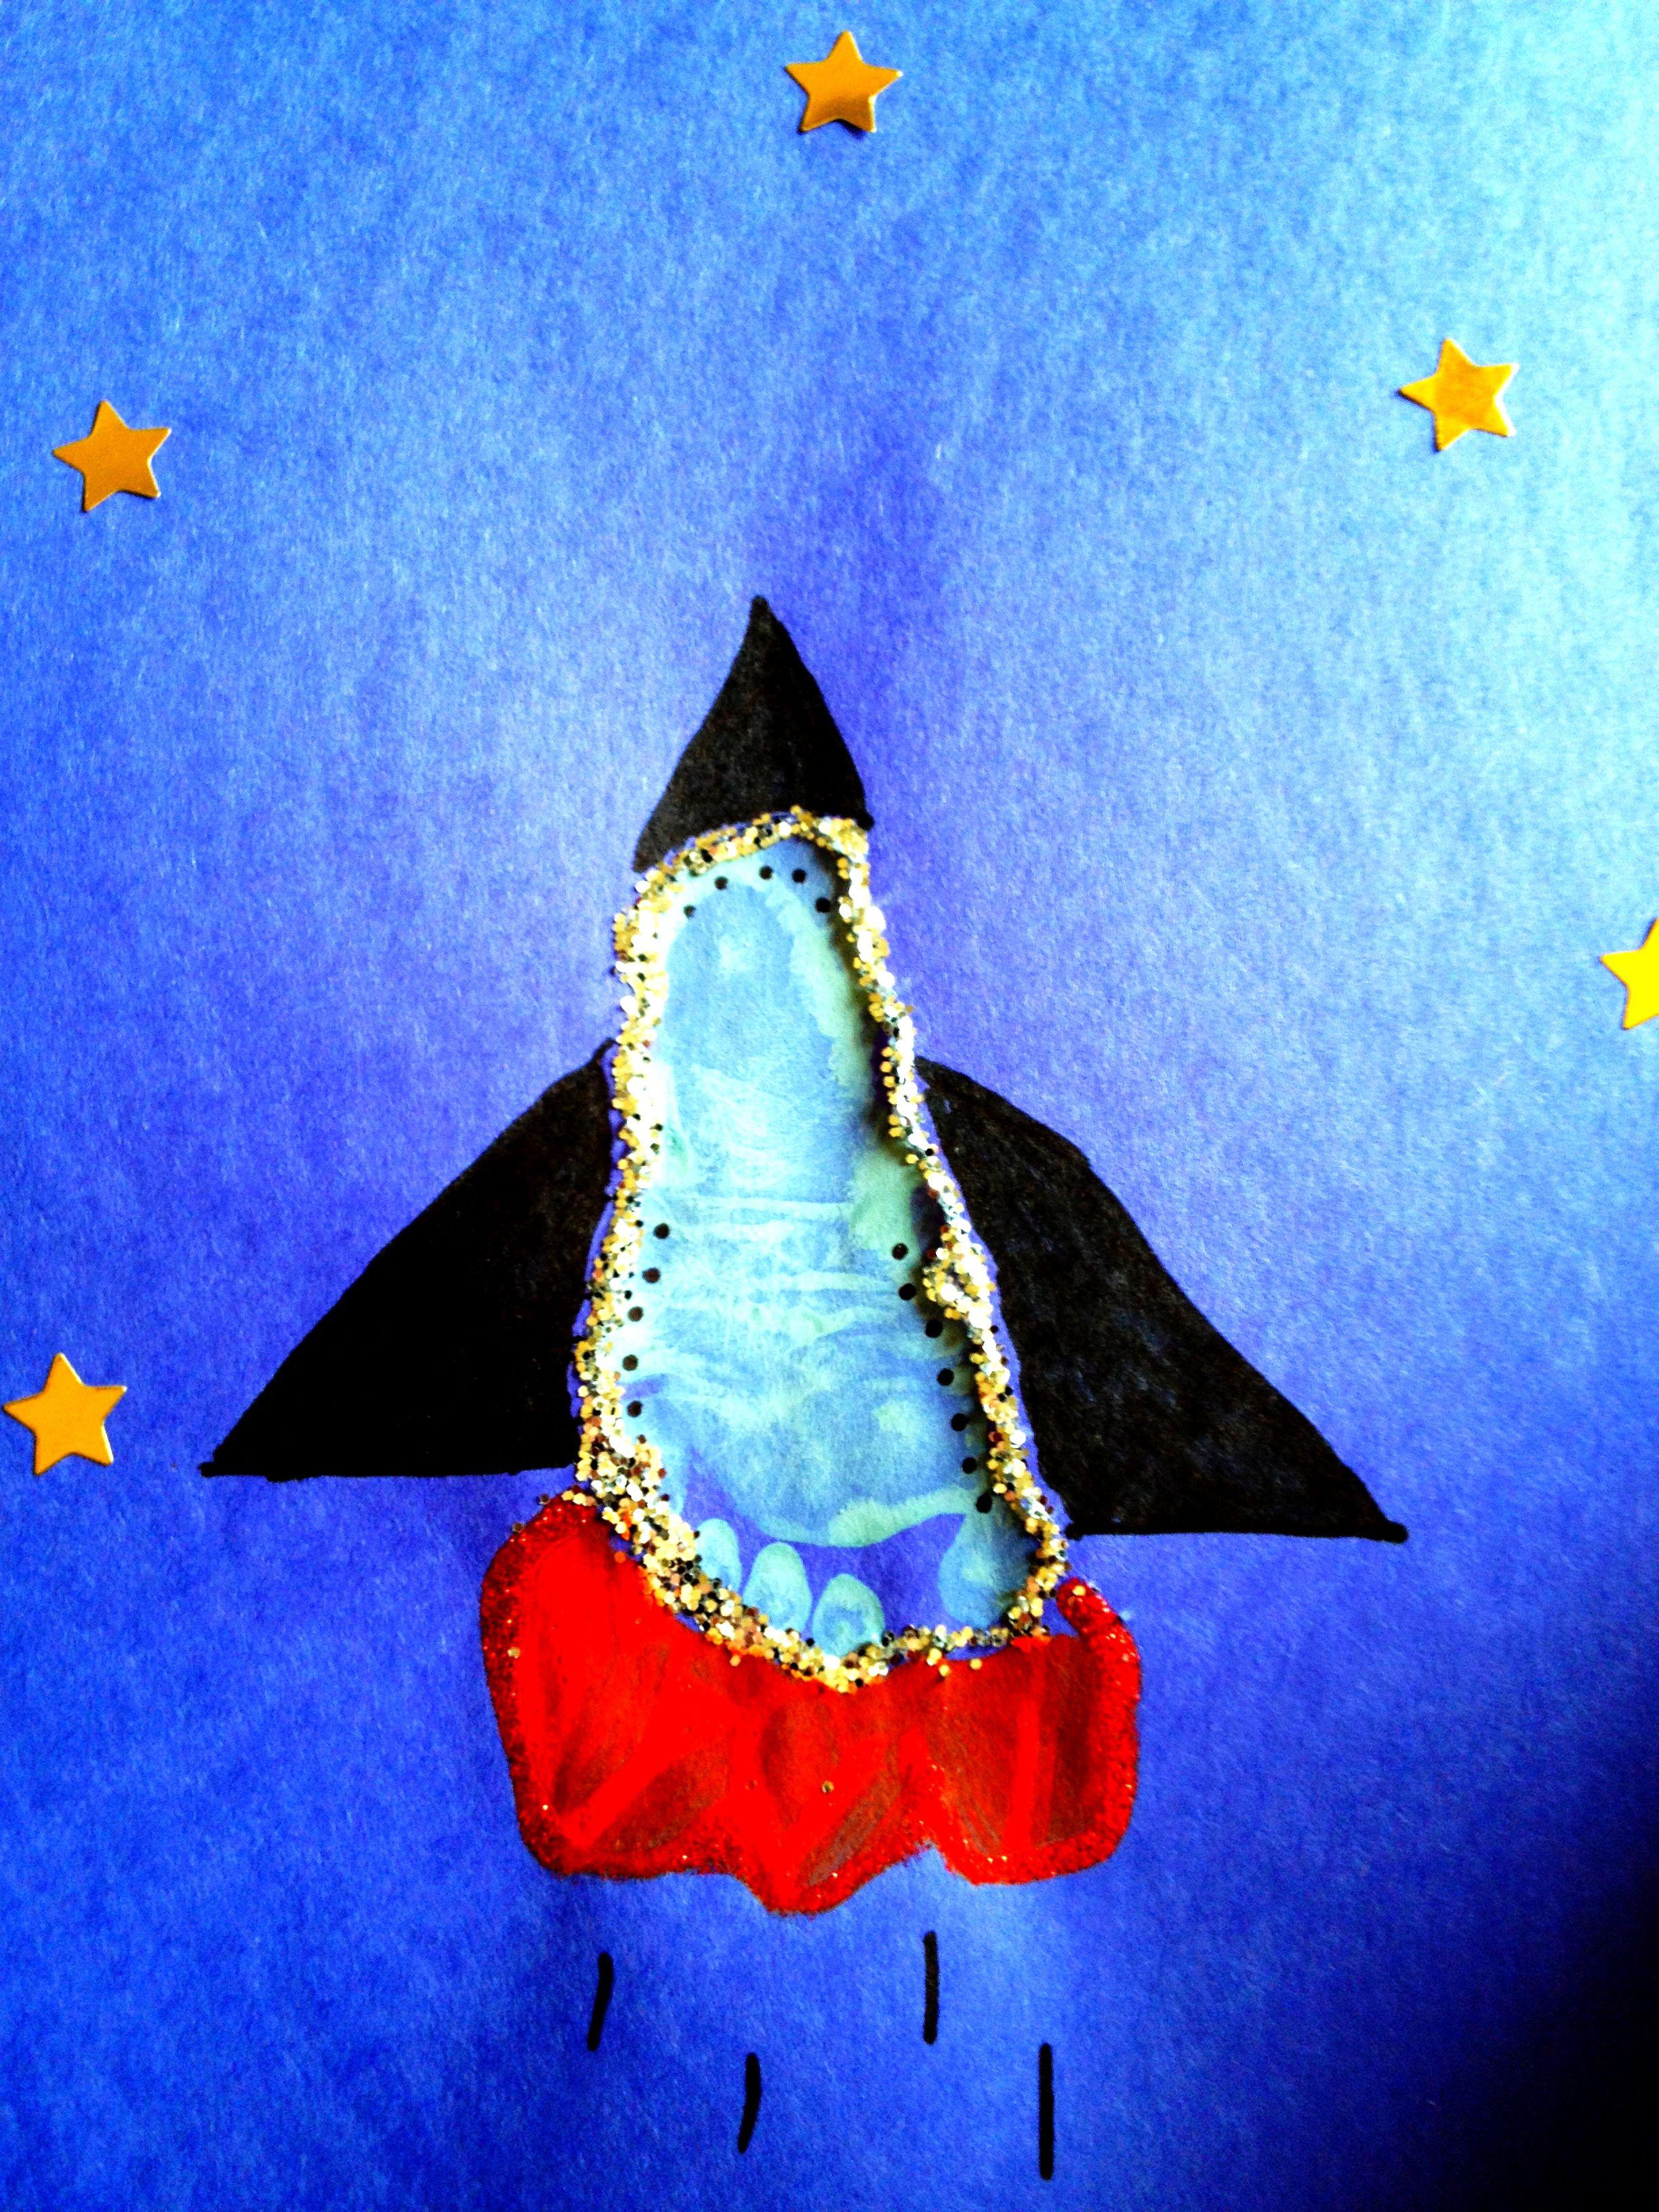 Footprint Rocket Ship Baby Art Project Kid Crafts And Activities